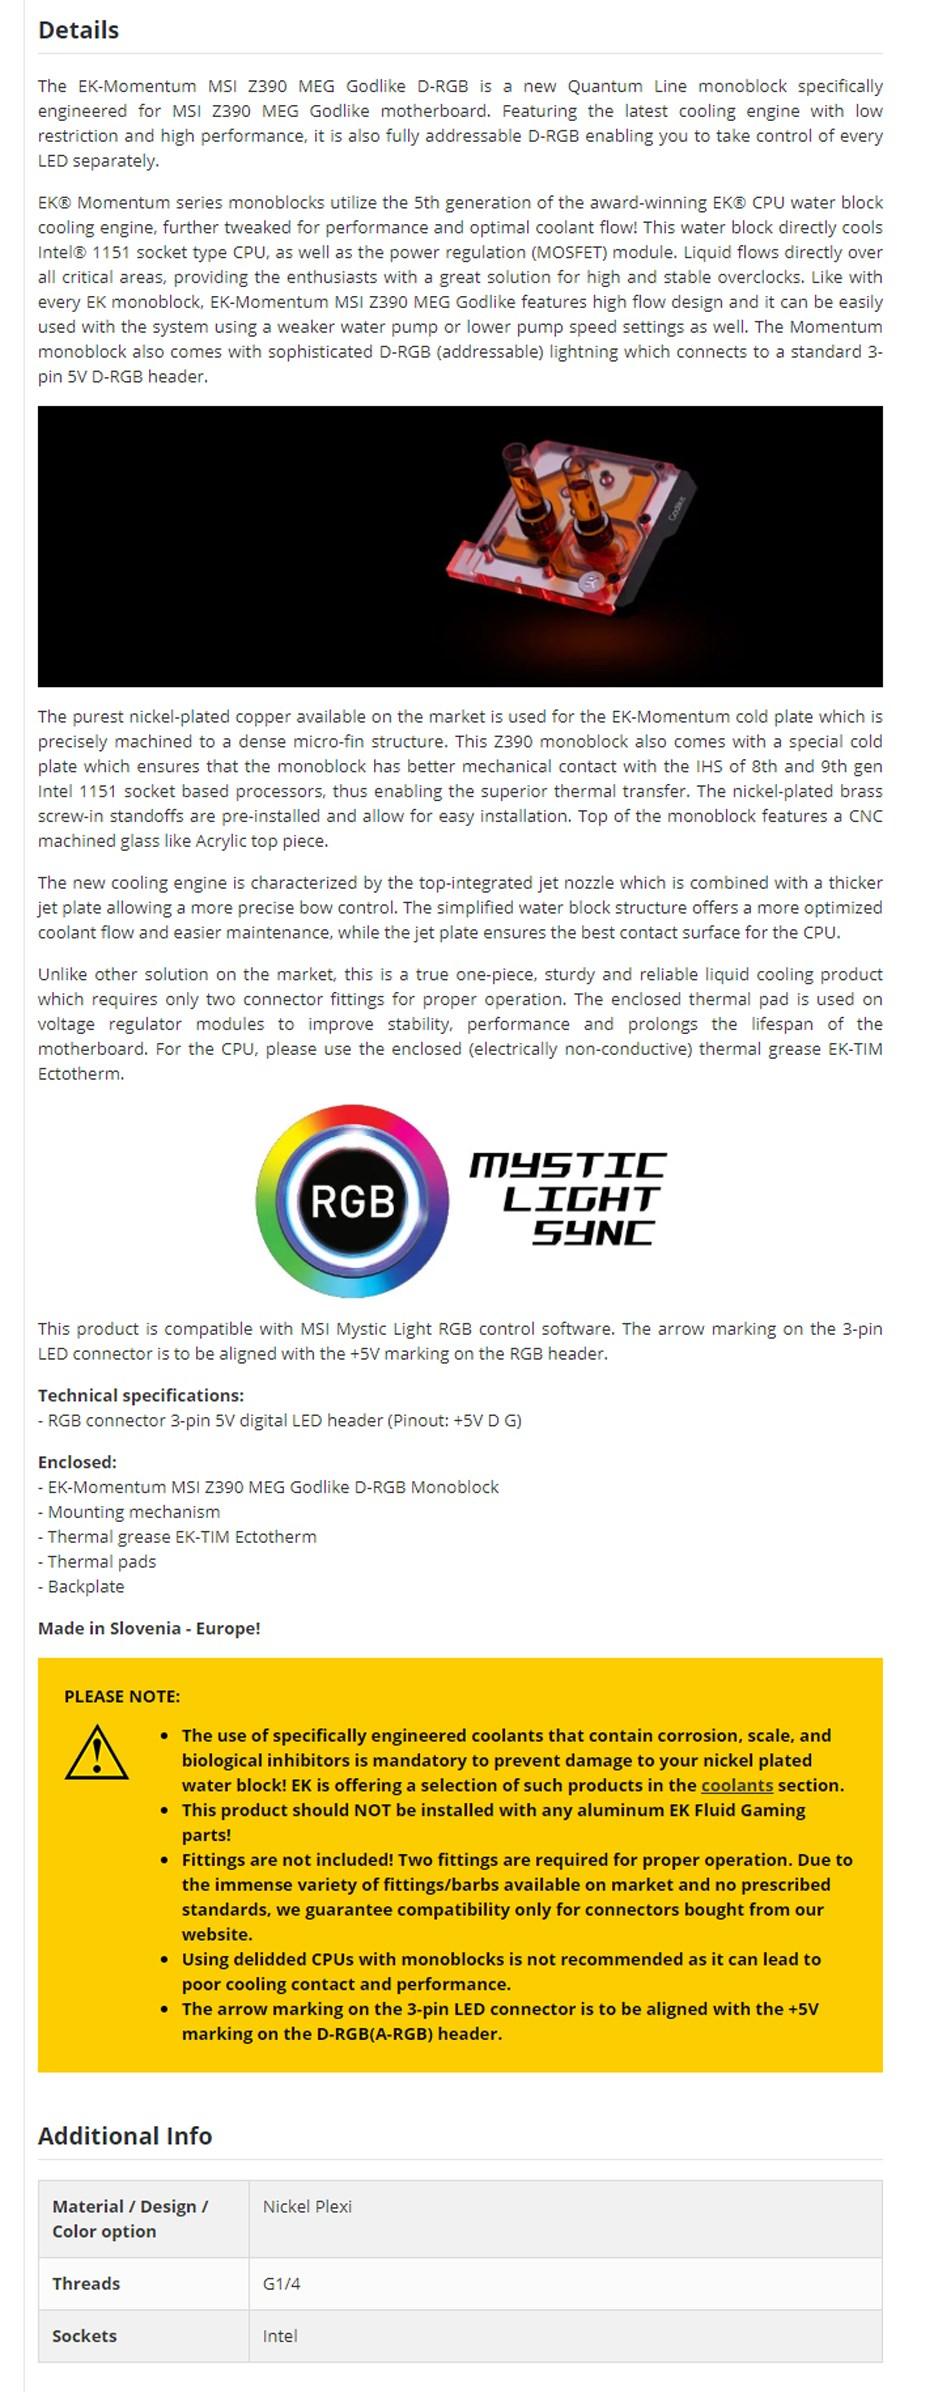 EKWB EK-Momentum RGB Quantum Line Monoblock for MSI Z390 Godlike D-RGB - Overview 1